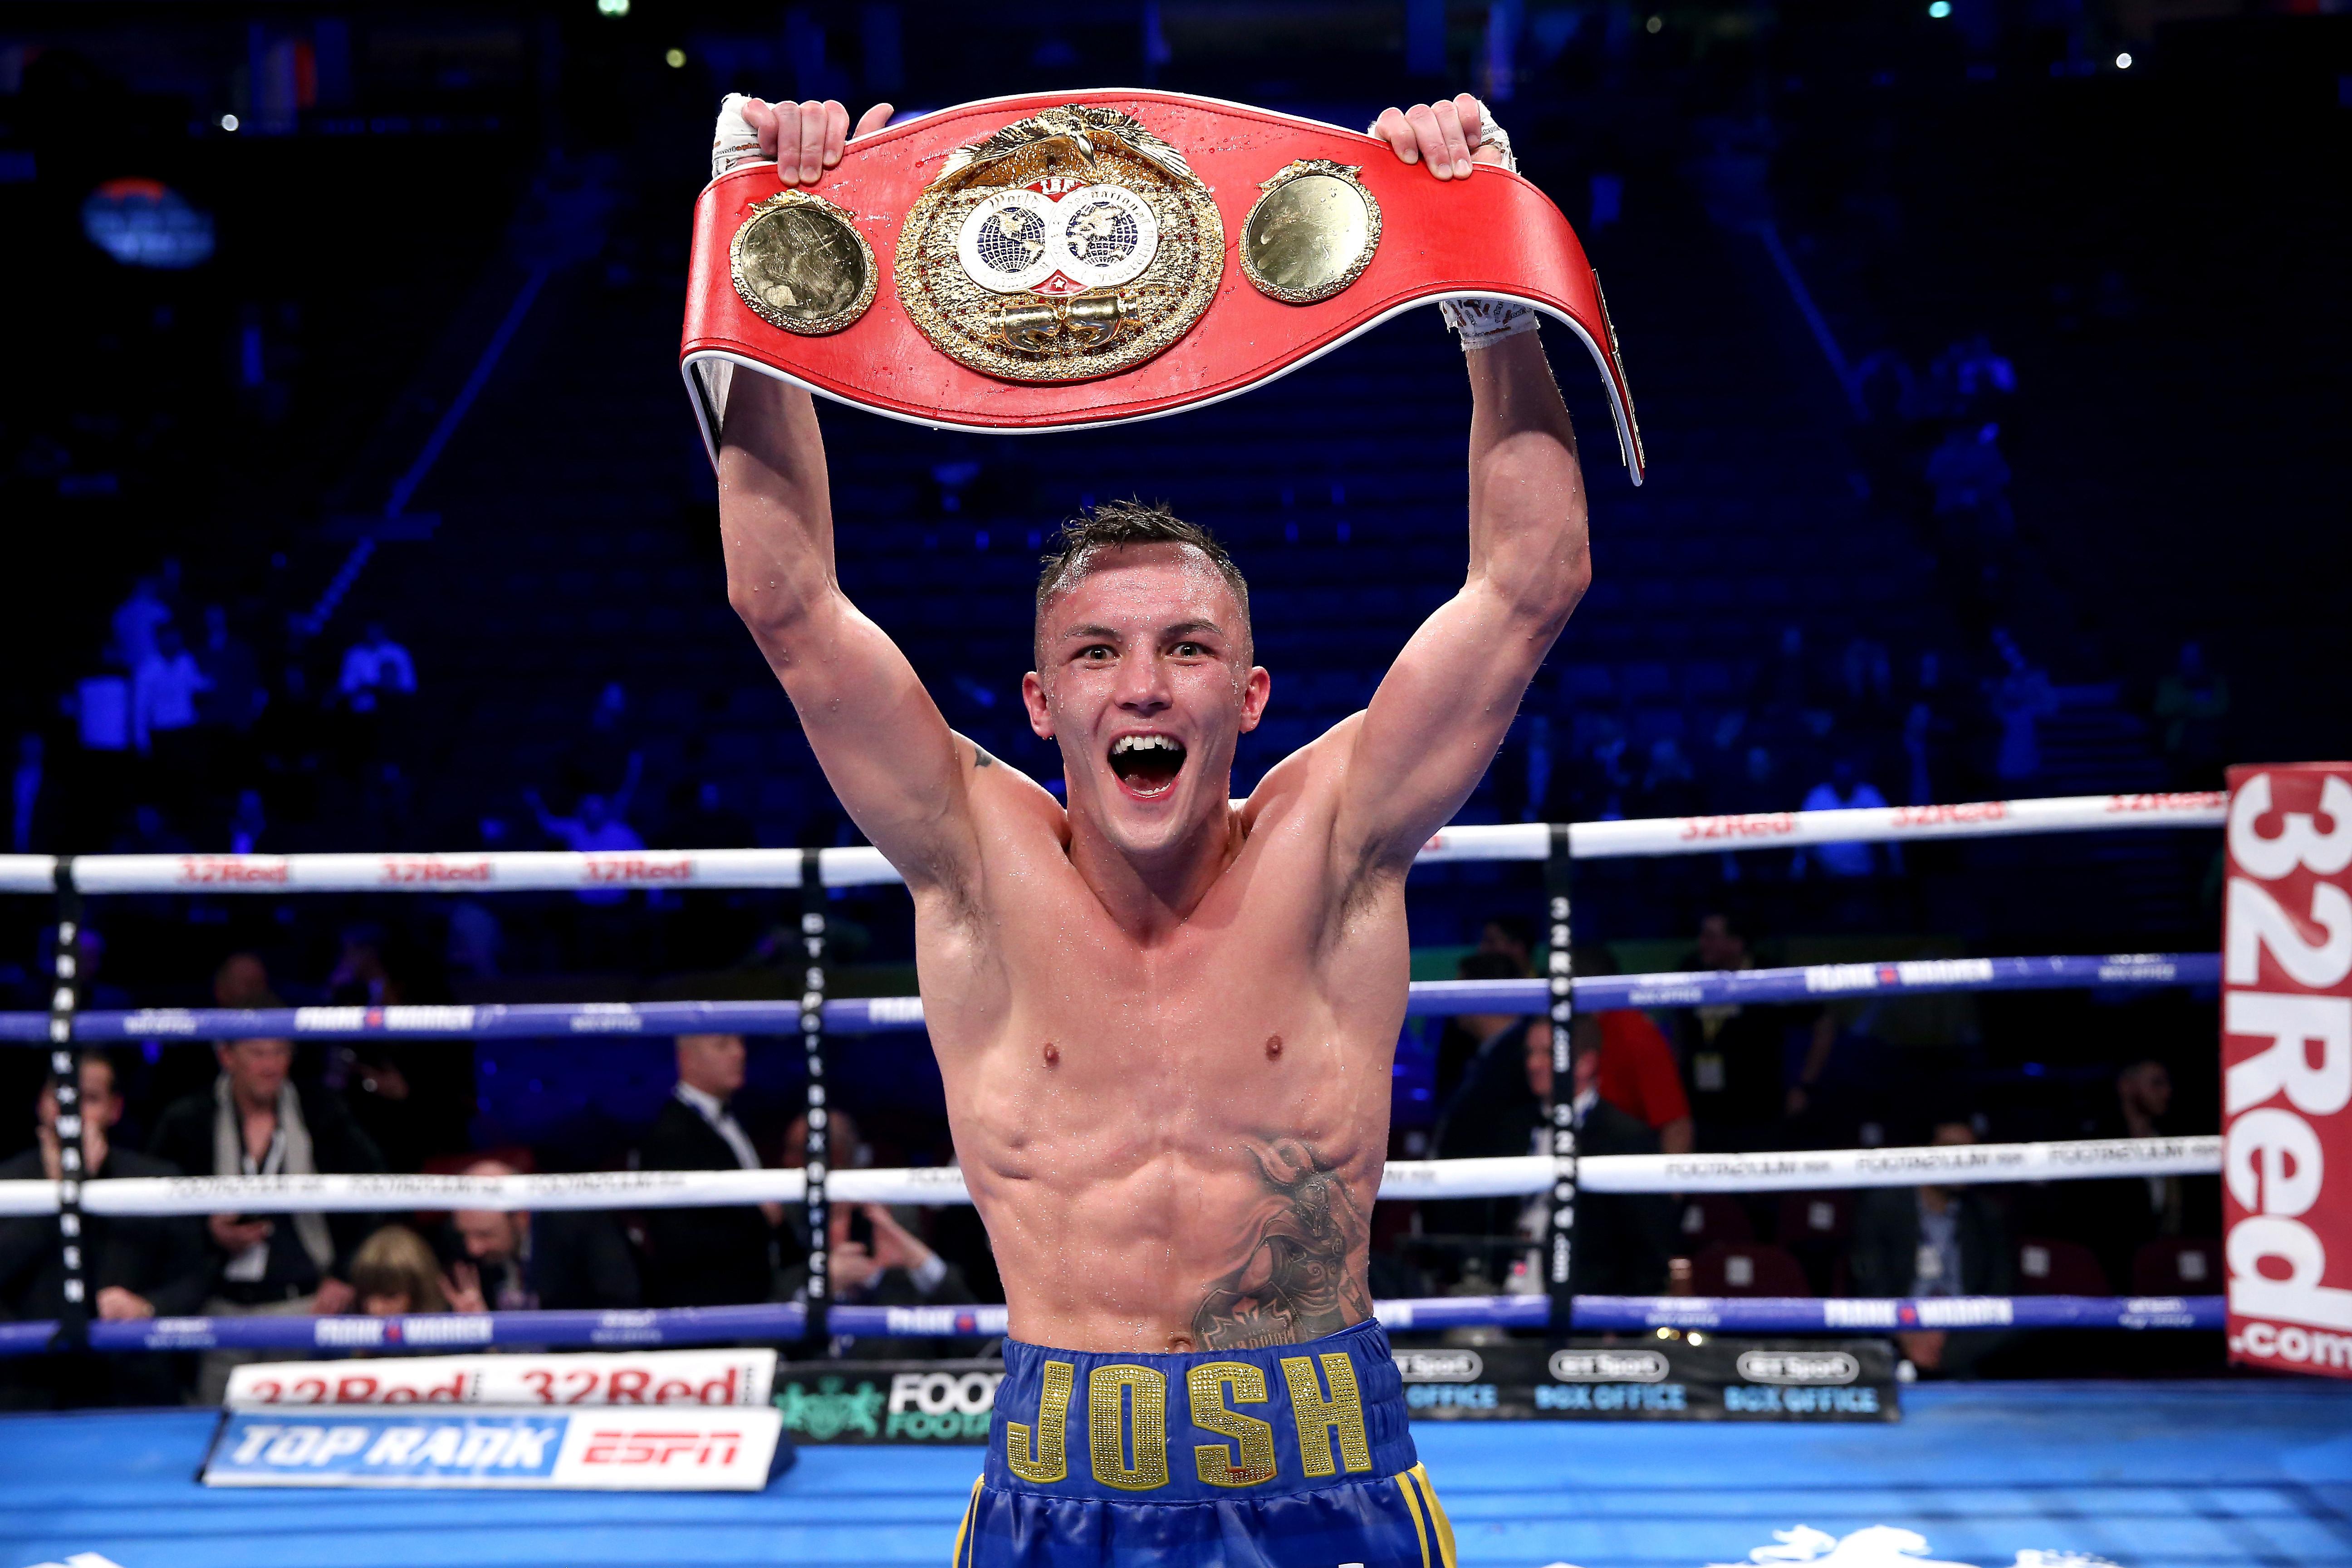 Josh Warrington is the IBF featherweight world champion